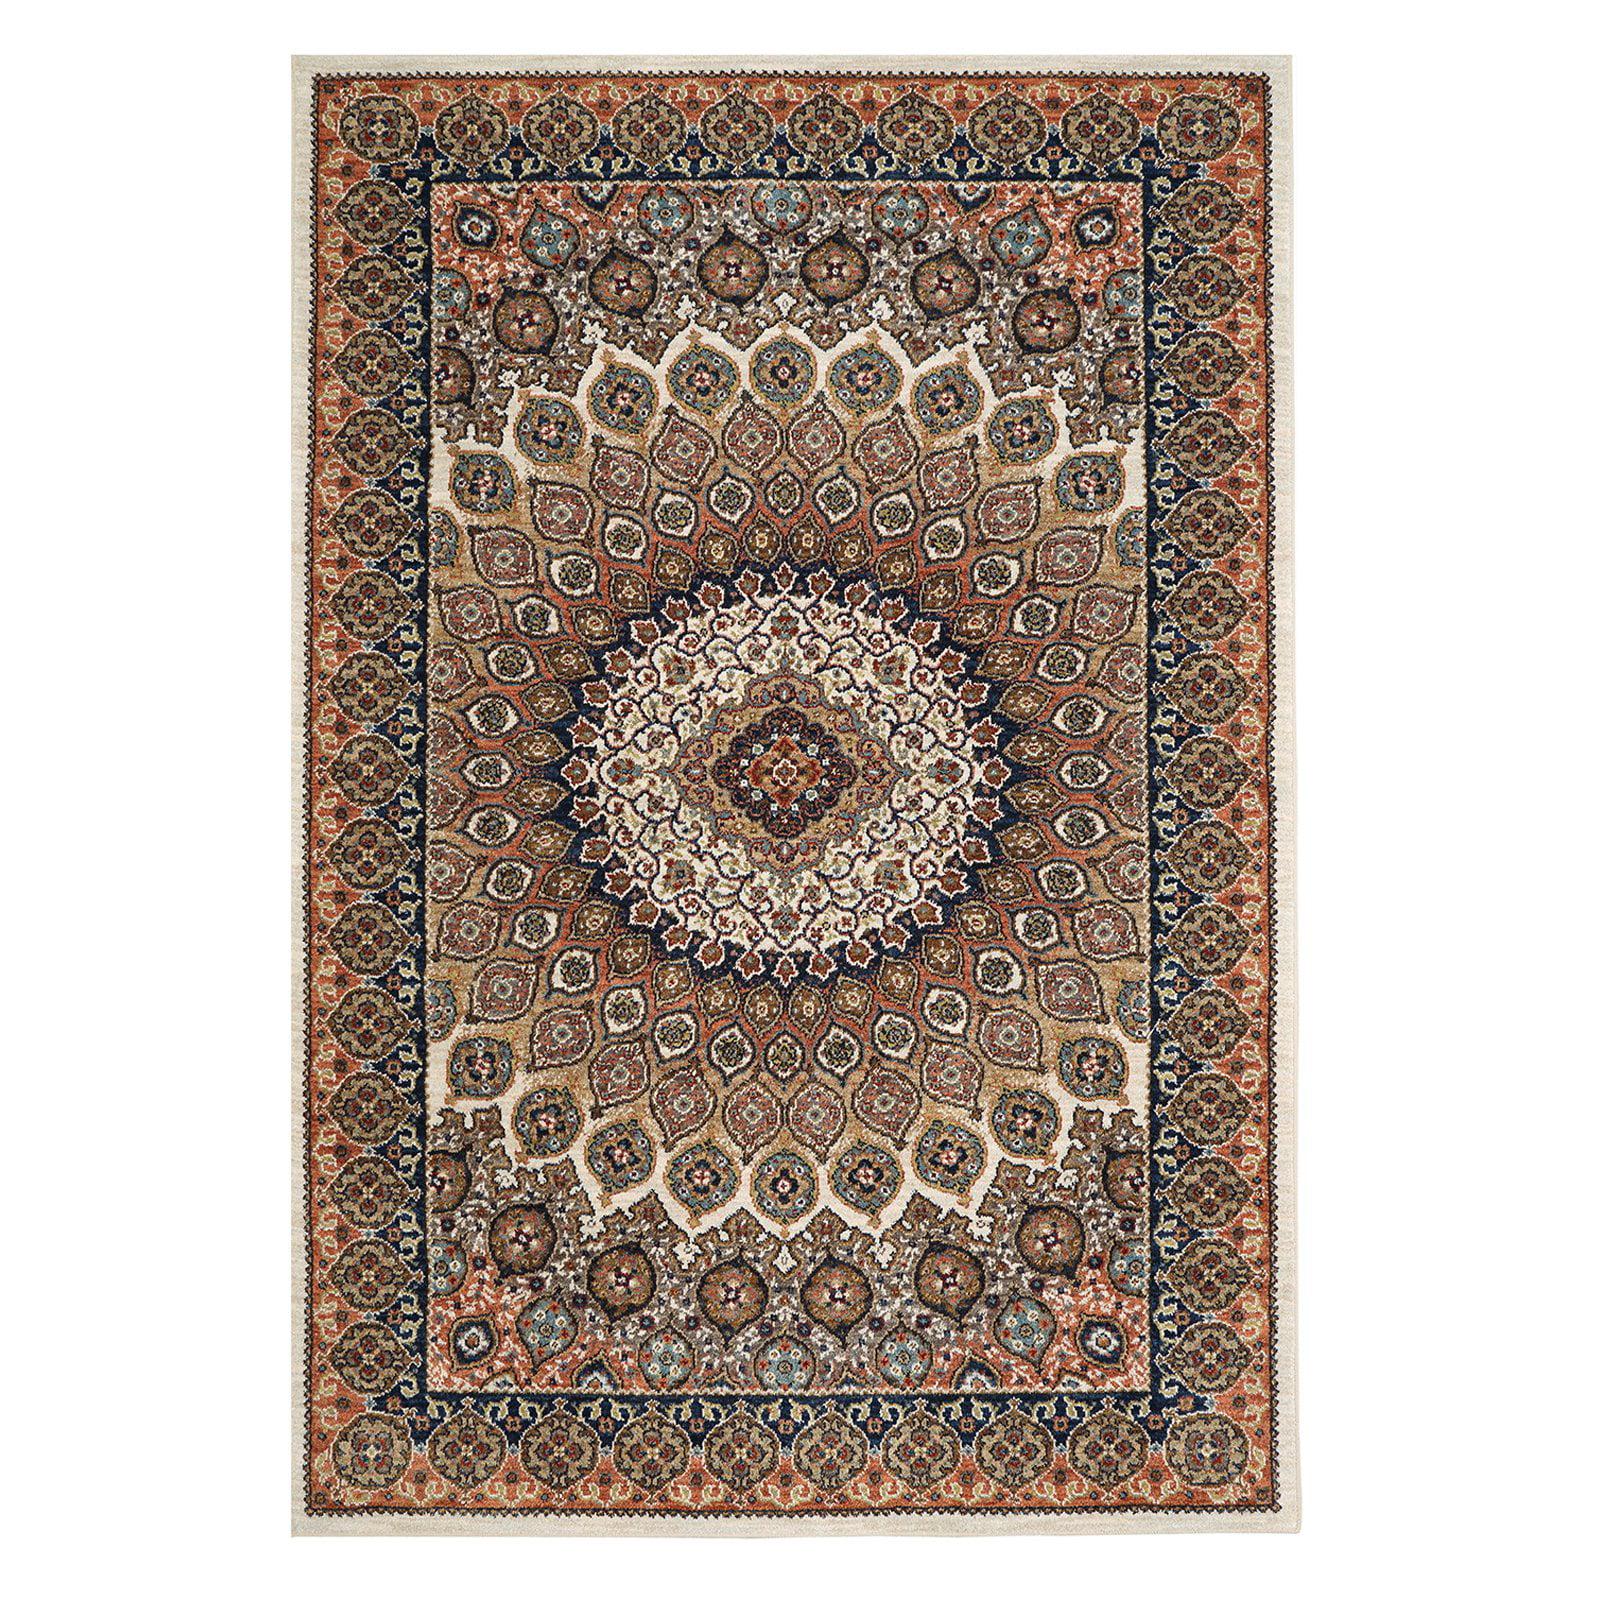 Karastan Wanderlust Hase Indoor Area Rug by Mohawk Carpet Distribution LP